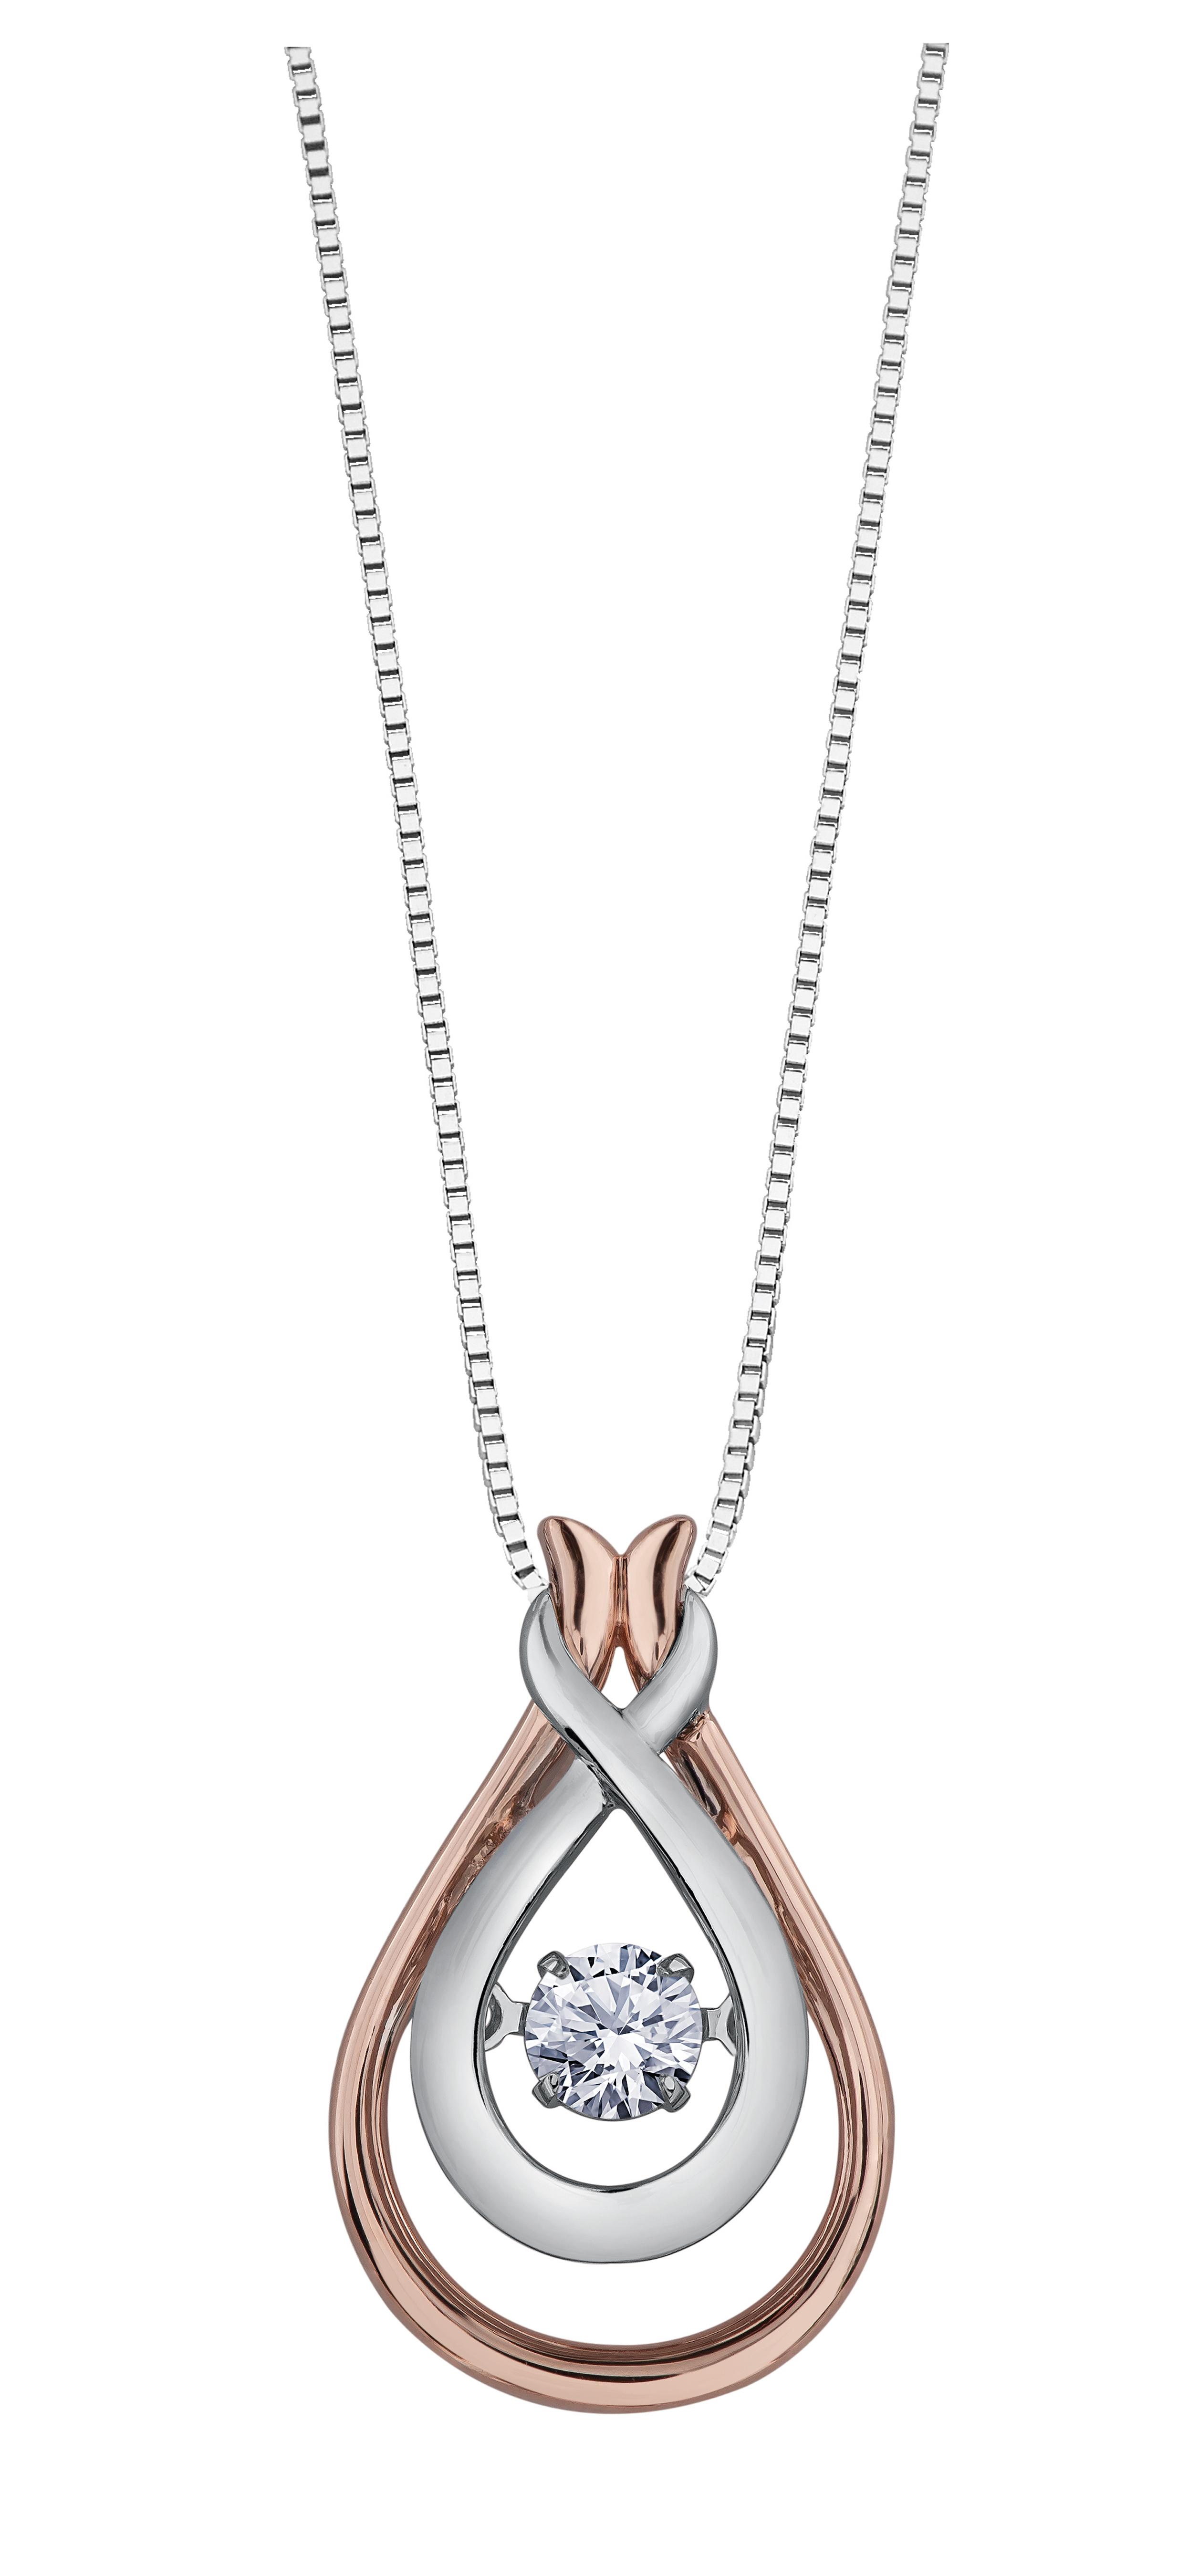 Pendentif - Or 2-tons 10K (rose et blanc) &Diamant Canadien totalisant 0.17 Carat